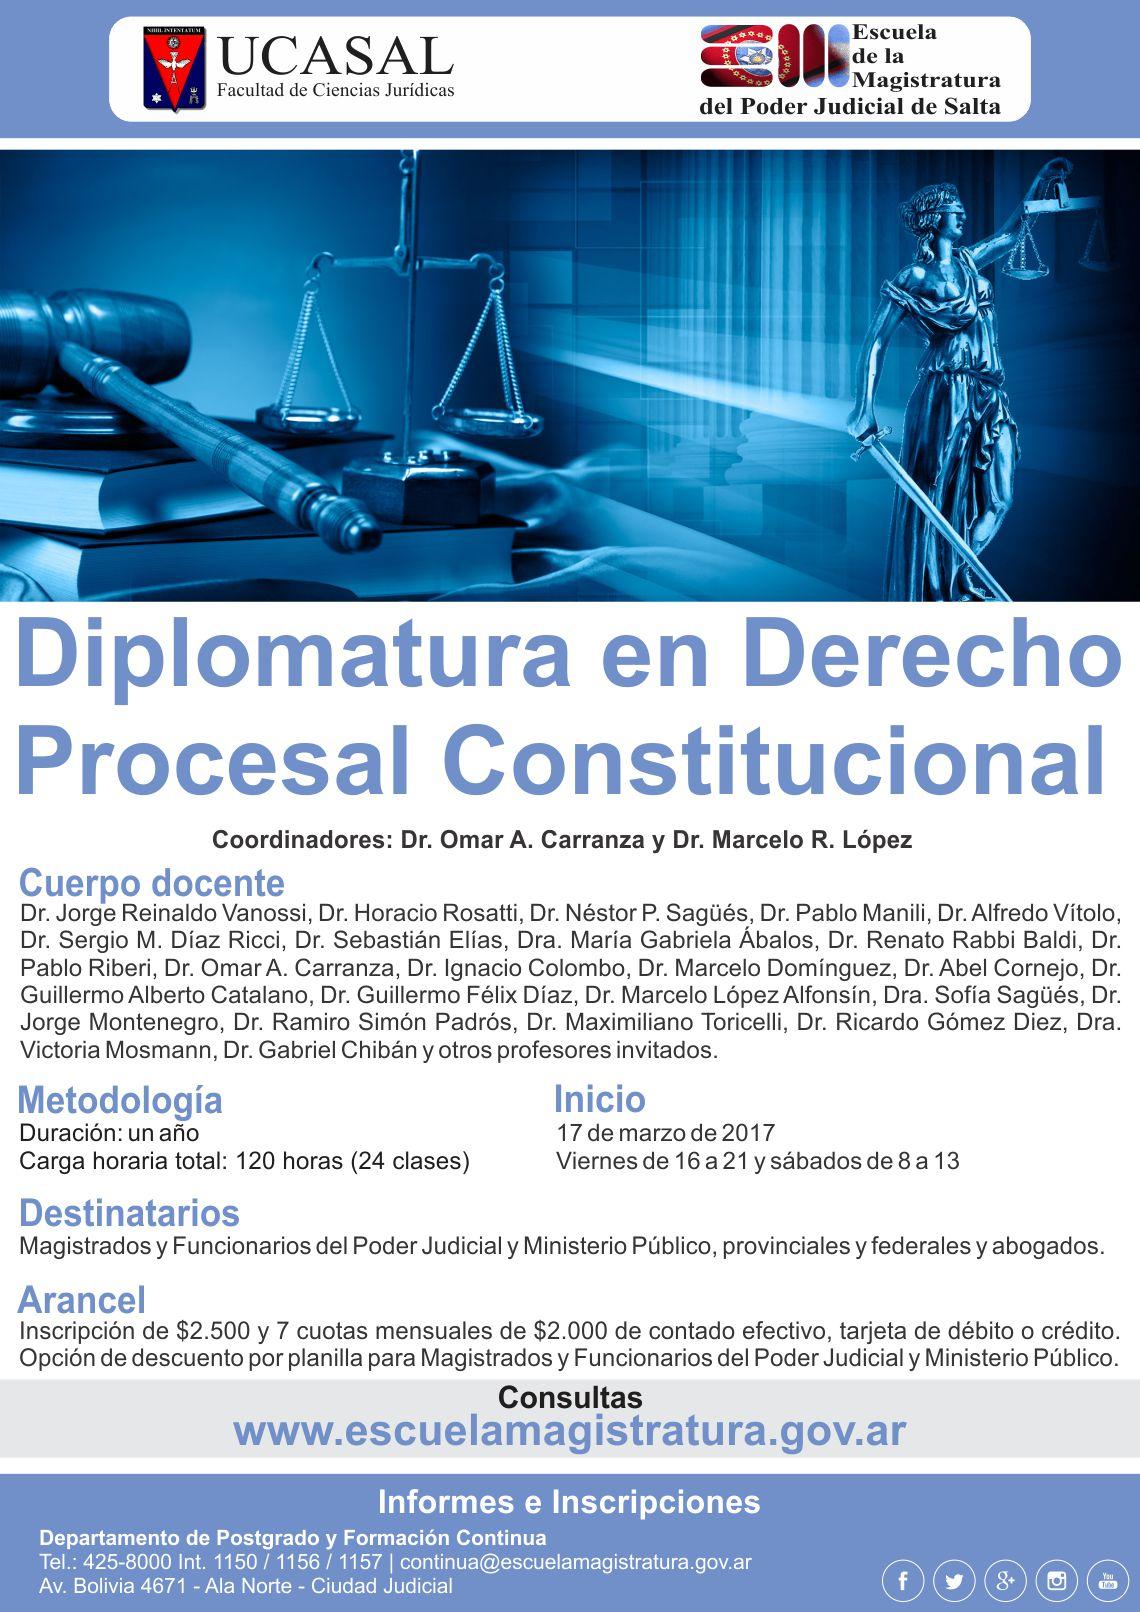 2017-DDPC-Diplomatura en Derecho Procesal Constitucional(1)